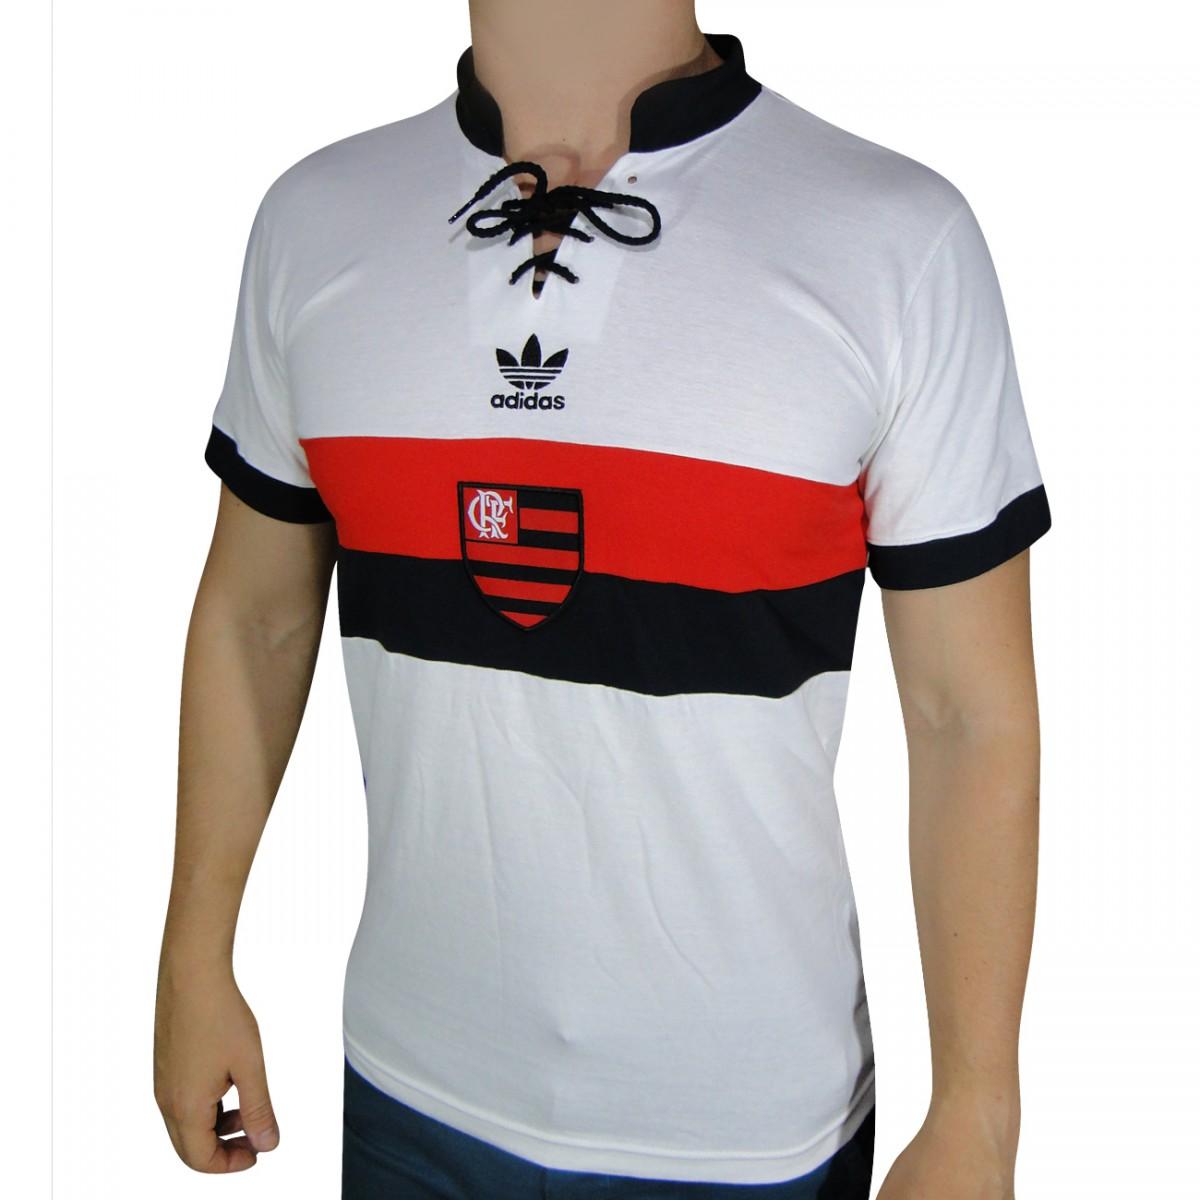 Camisa Adidas Flamengo Retro S09183 - Branco - Chuteira Nike 73eb5666478a0